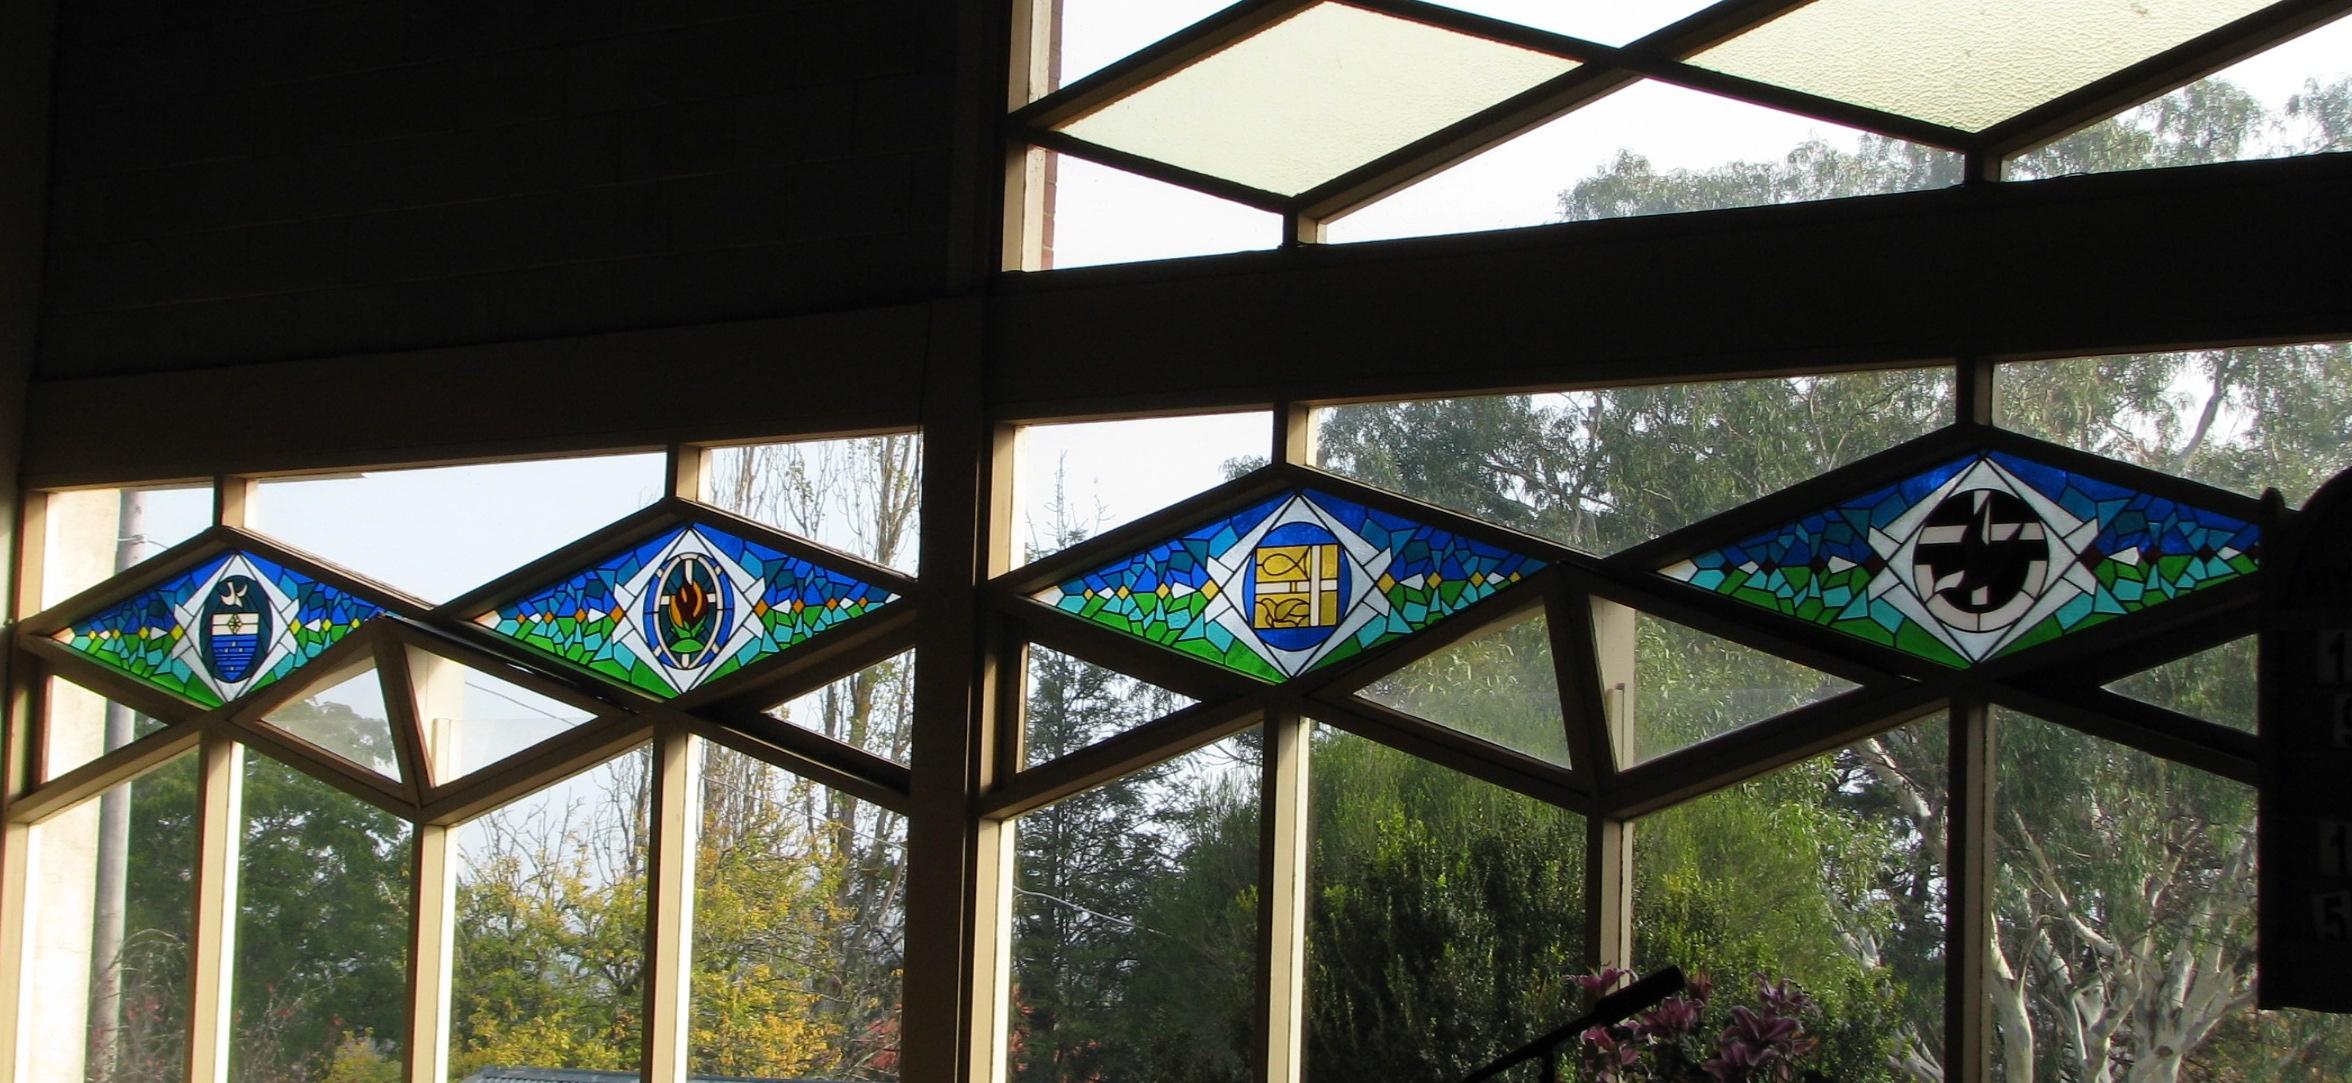 2- church windows Uniting badges - CrosslightCrosslight